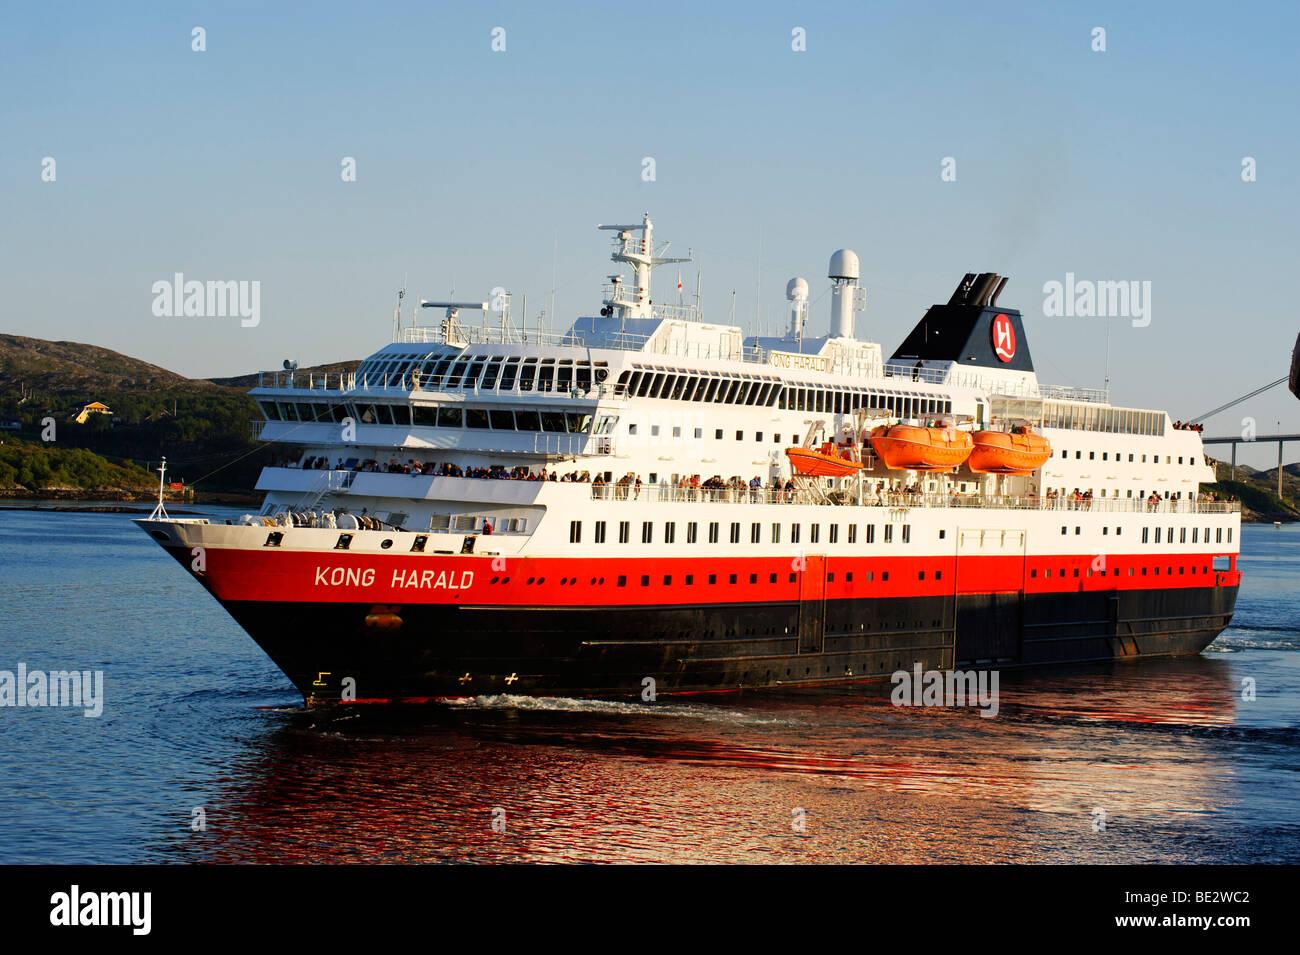 MS Kong Harald, Hurtigruten, Rorvik, Norway, Scandinavia, Europe - Stock Image